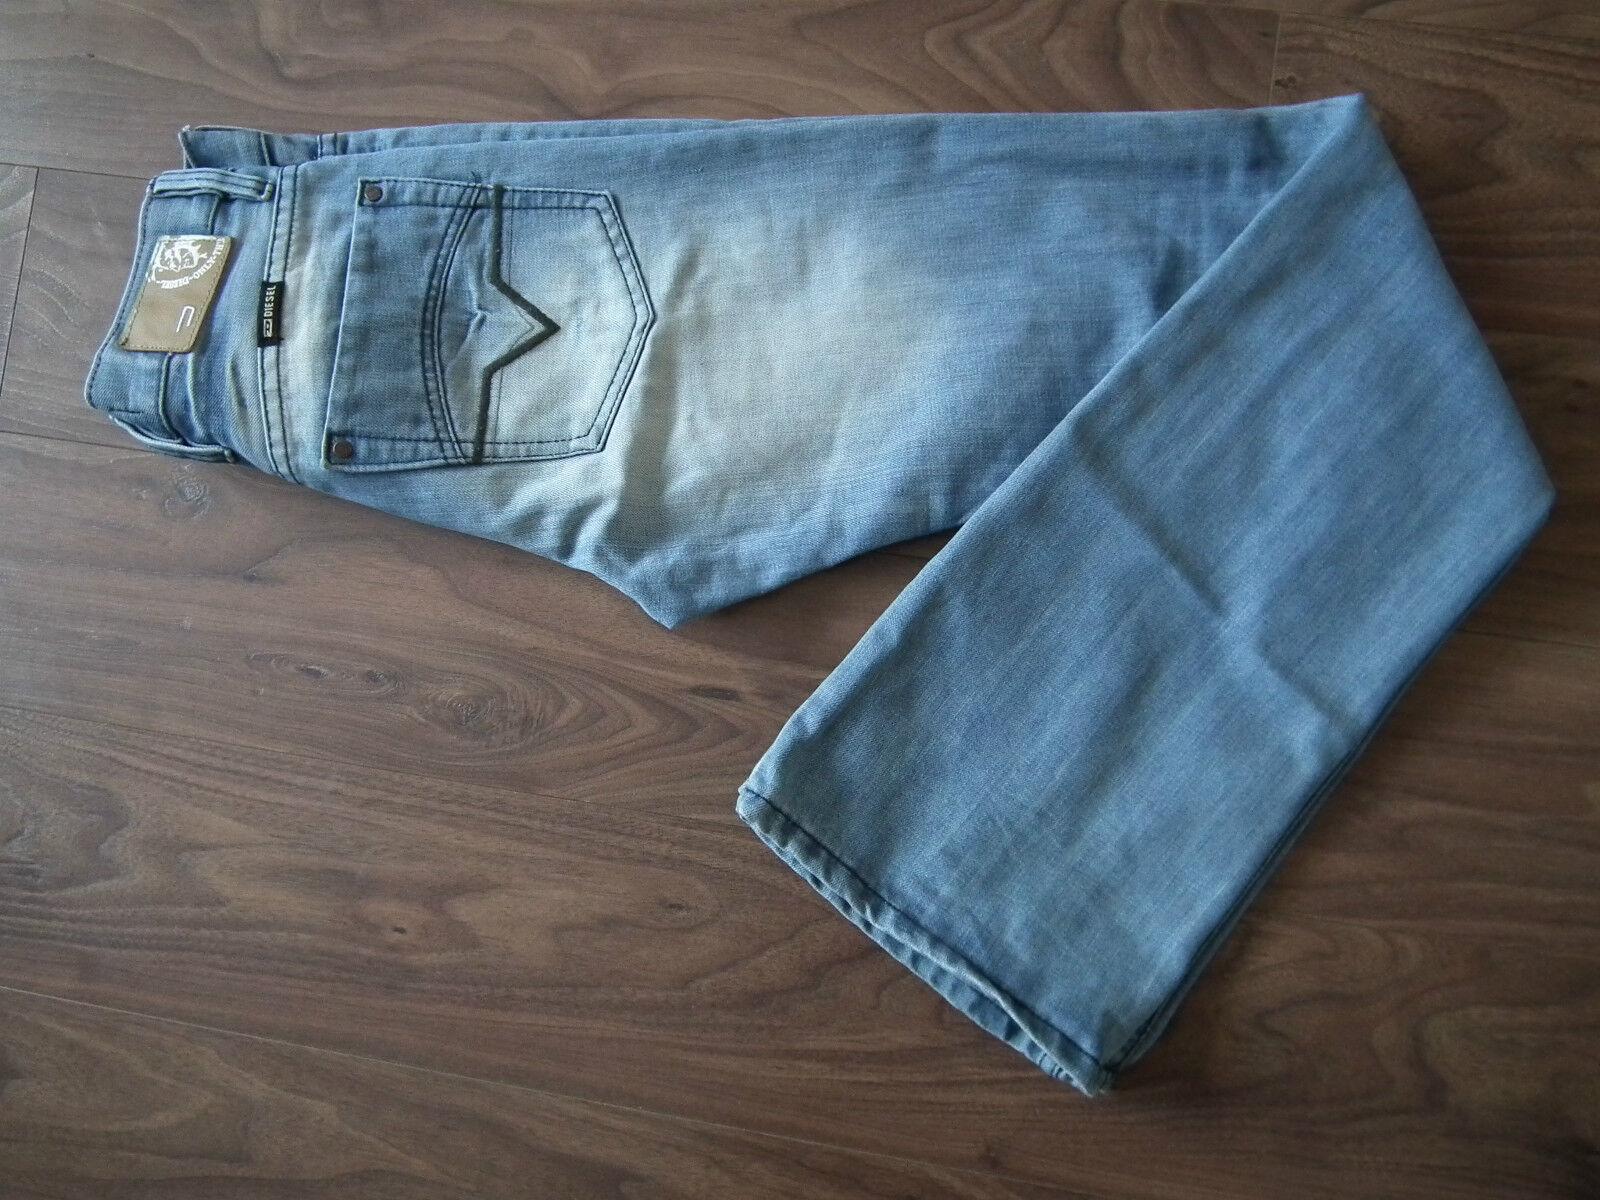 DIESEL Industry Denim Blu Scoloreito da uomo ROODY Jeans dritti PANTALONI W29 L34